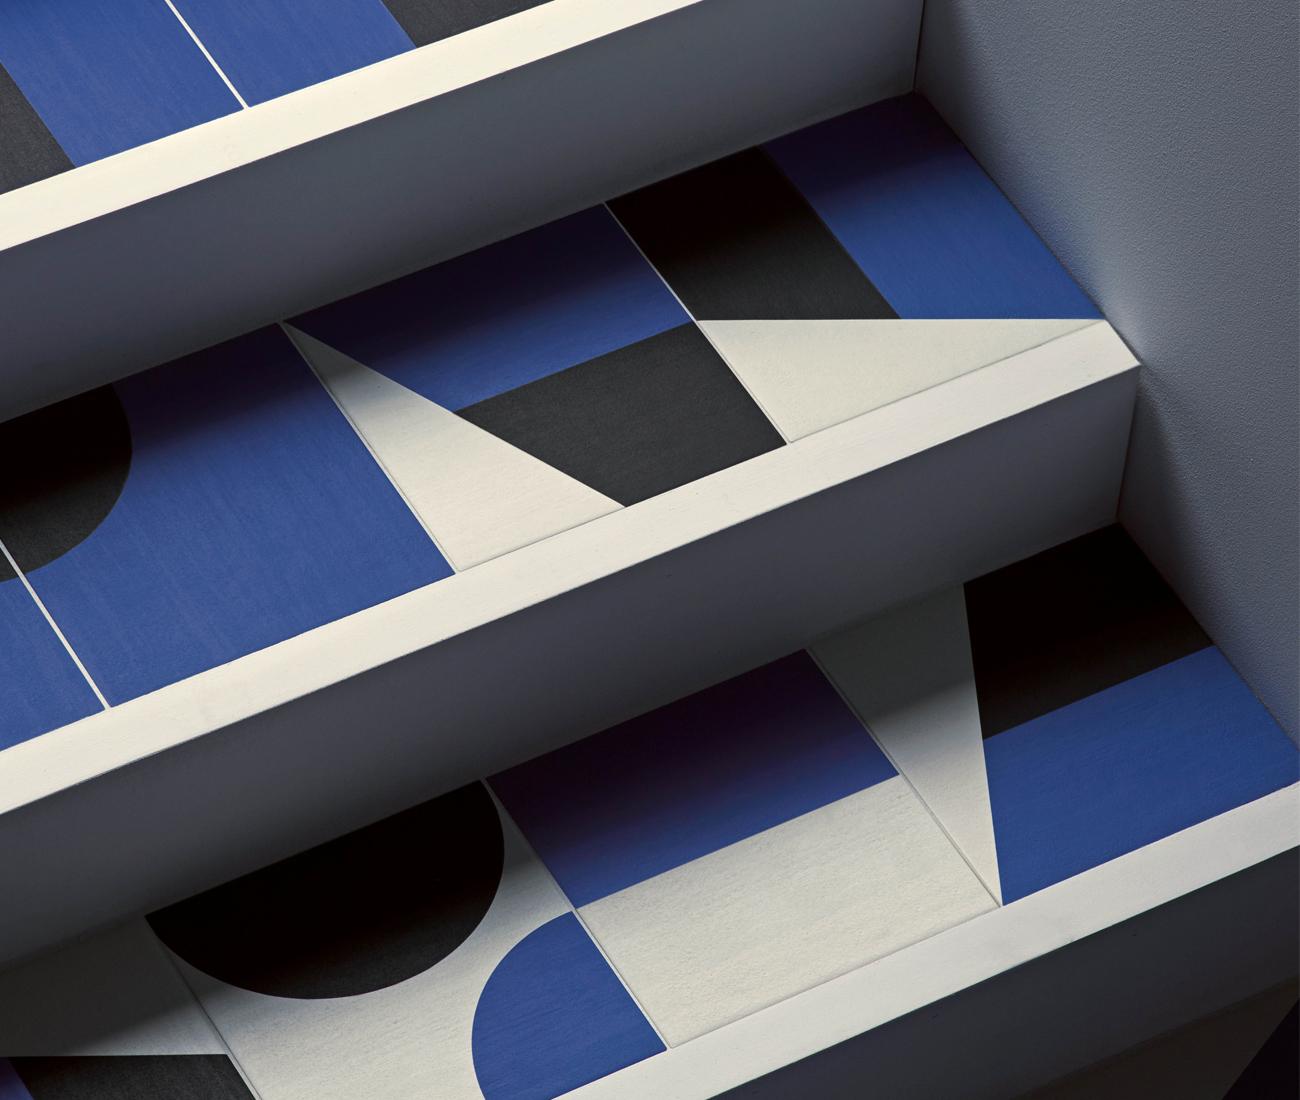 DL-G17-Stuff-Tiles-6